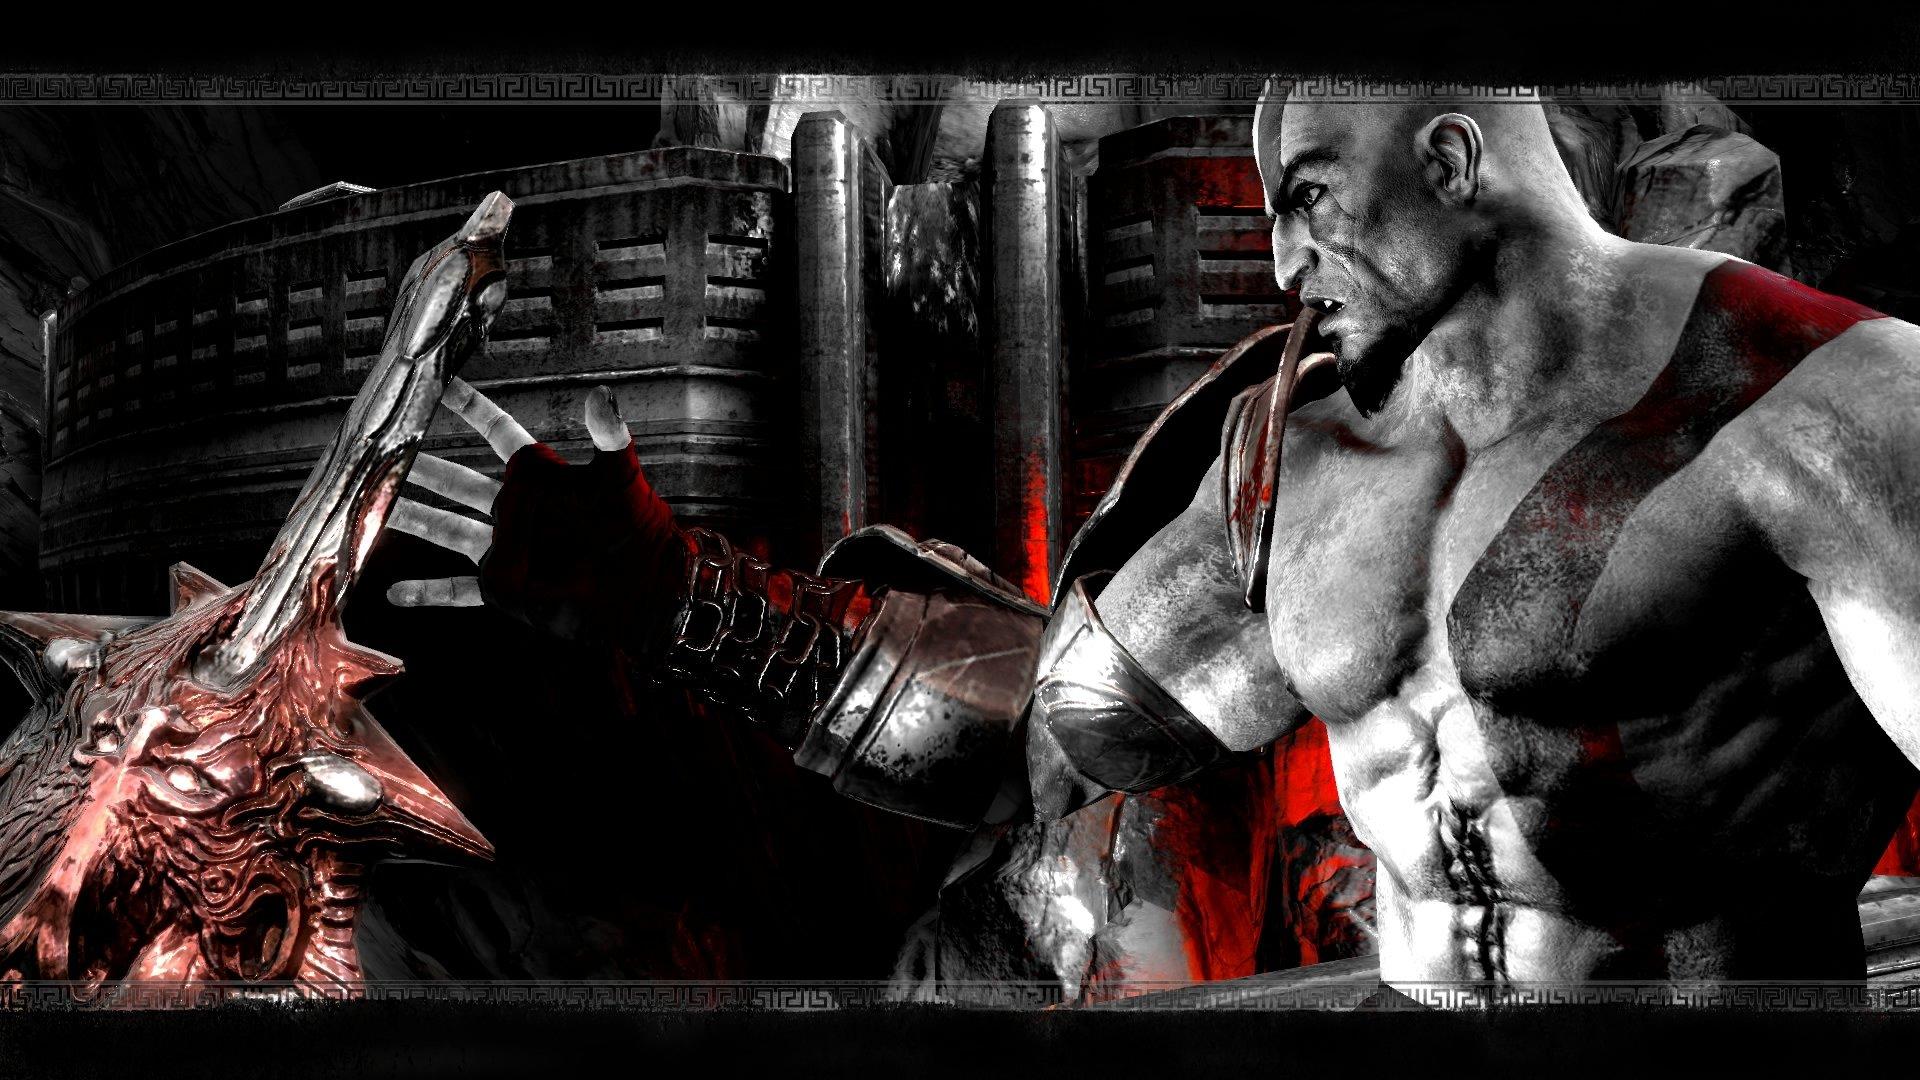 Adesivo De Parede God Of War ~ Análisis de God of War 3 Remastered para PS4 3DJuegos